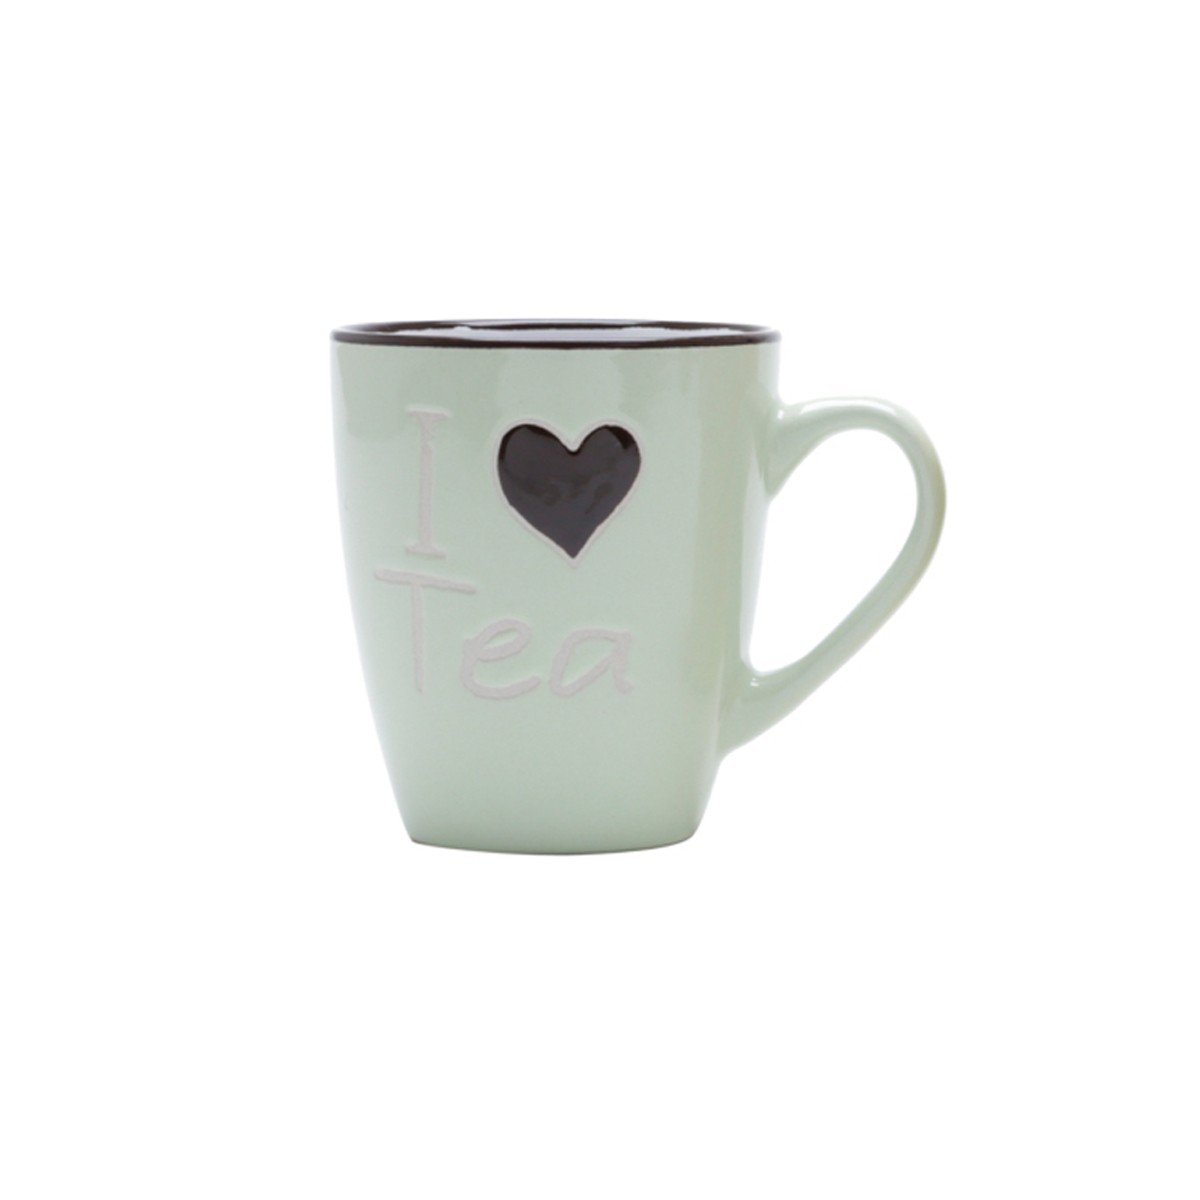 caneca porcelana i love tea 200ml bon gourmet cinza 26103v bon goumert casa cafe e mel